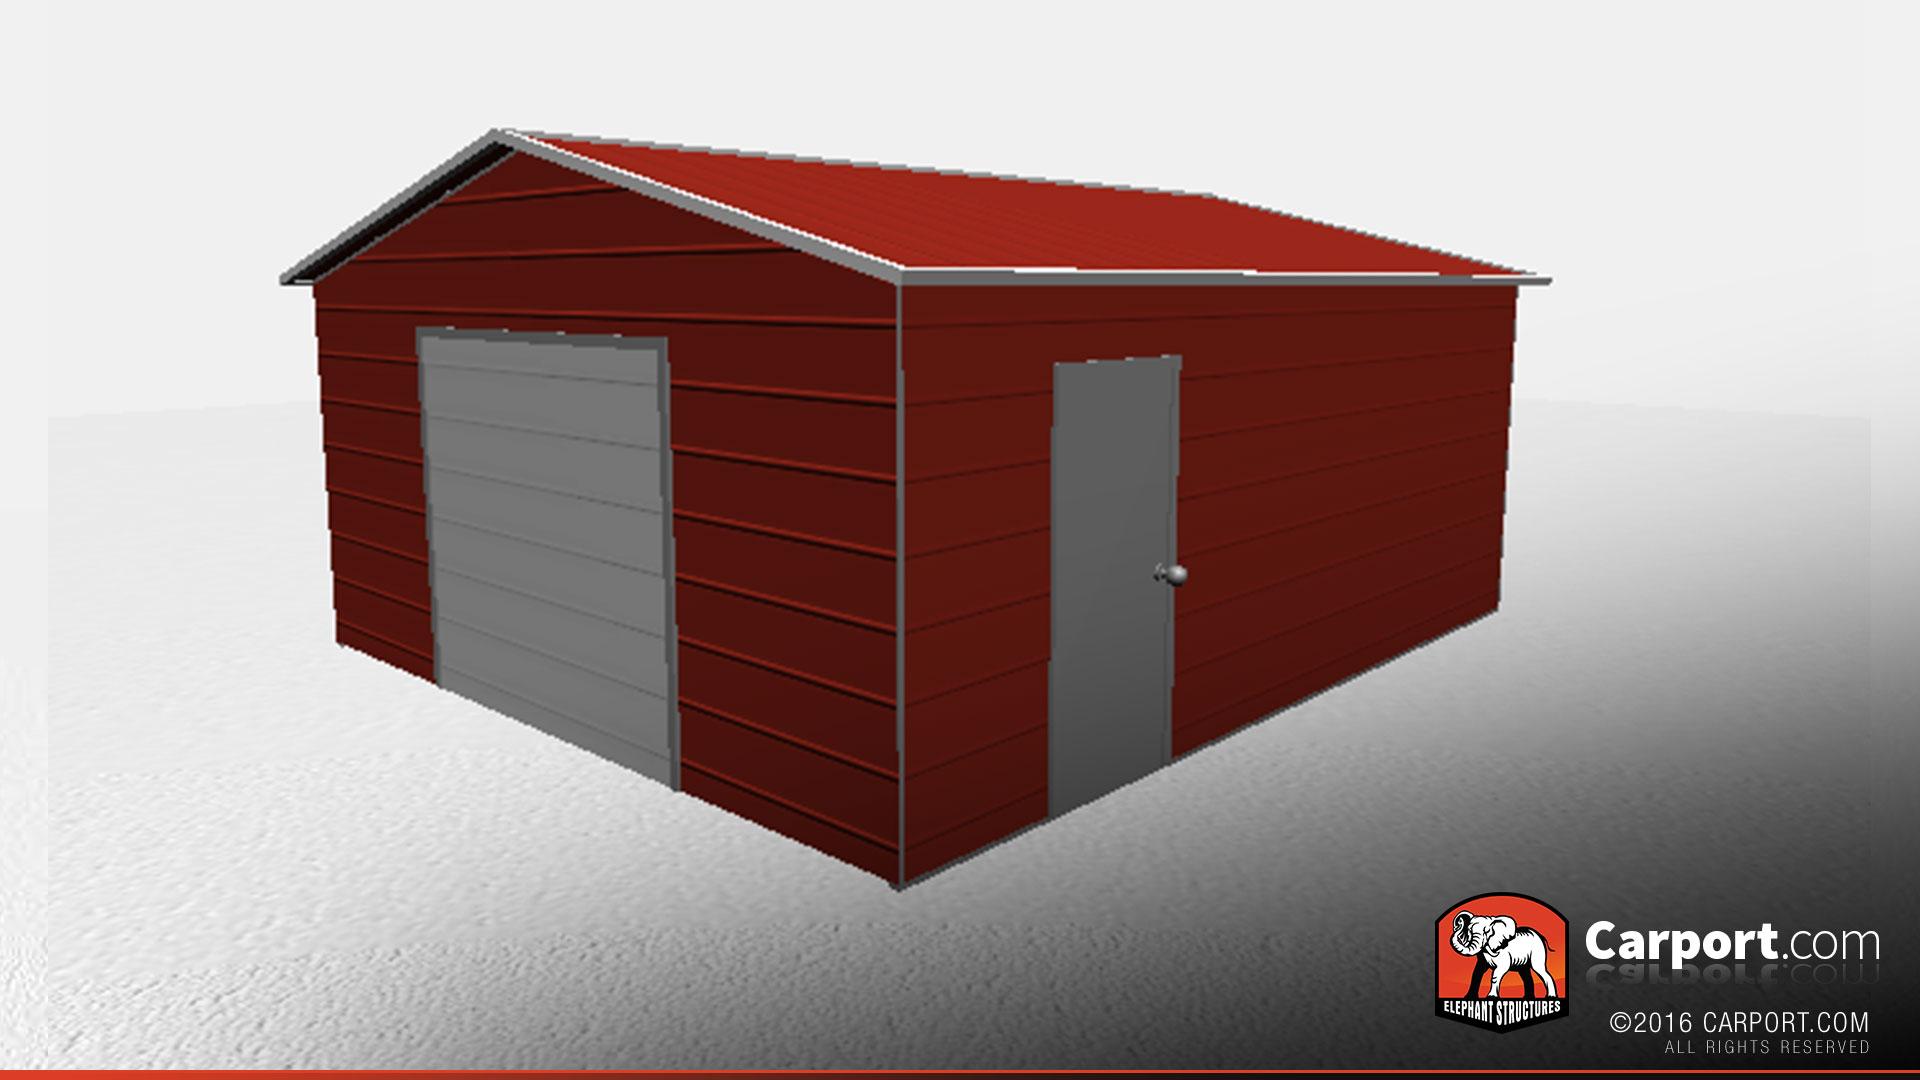 18 X 21 X 8 Vertical Roof Enclosed Metal Garage Metal